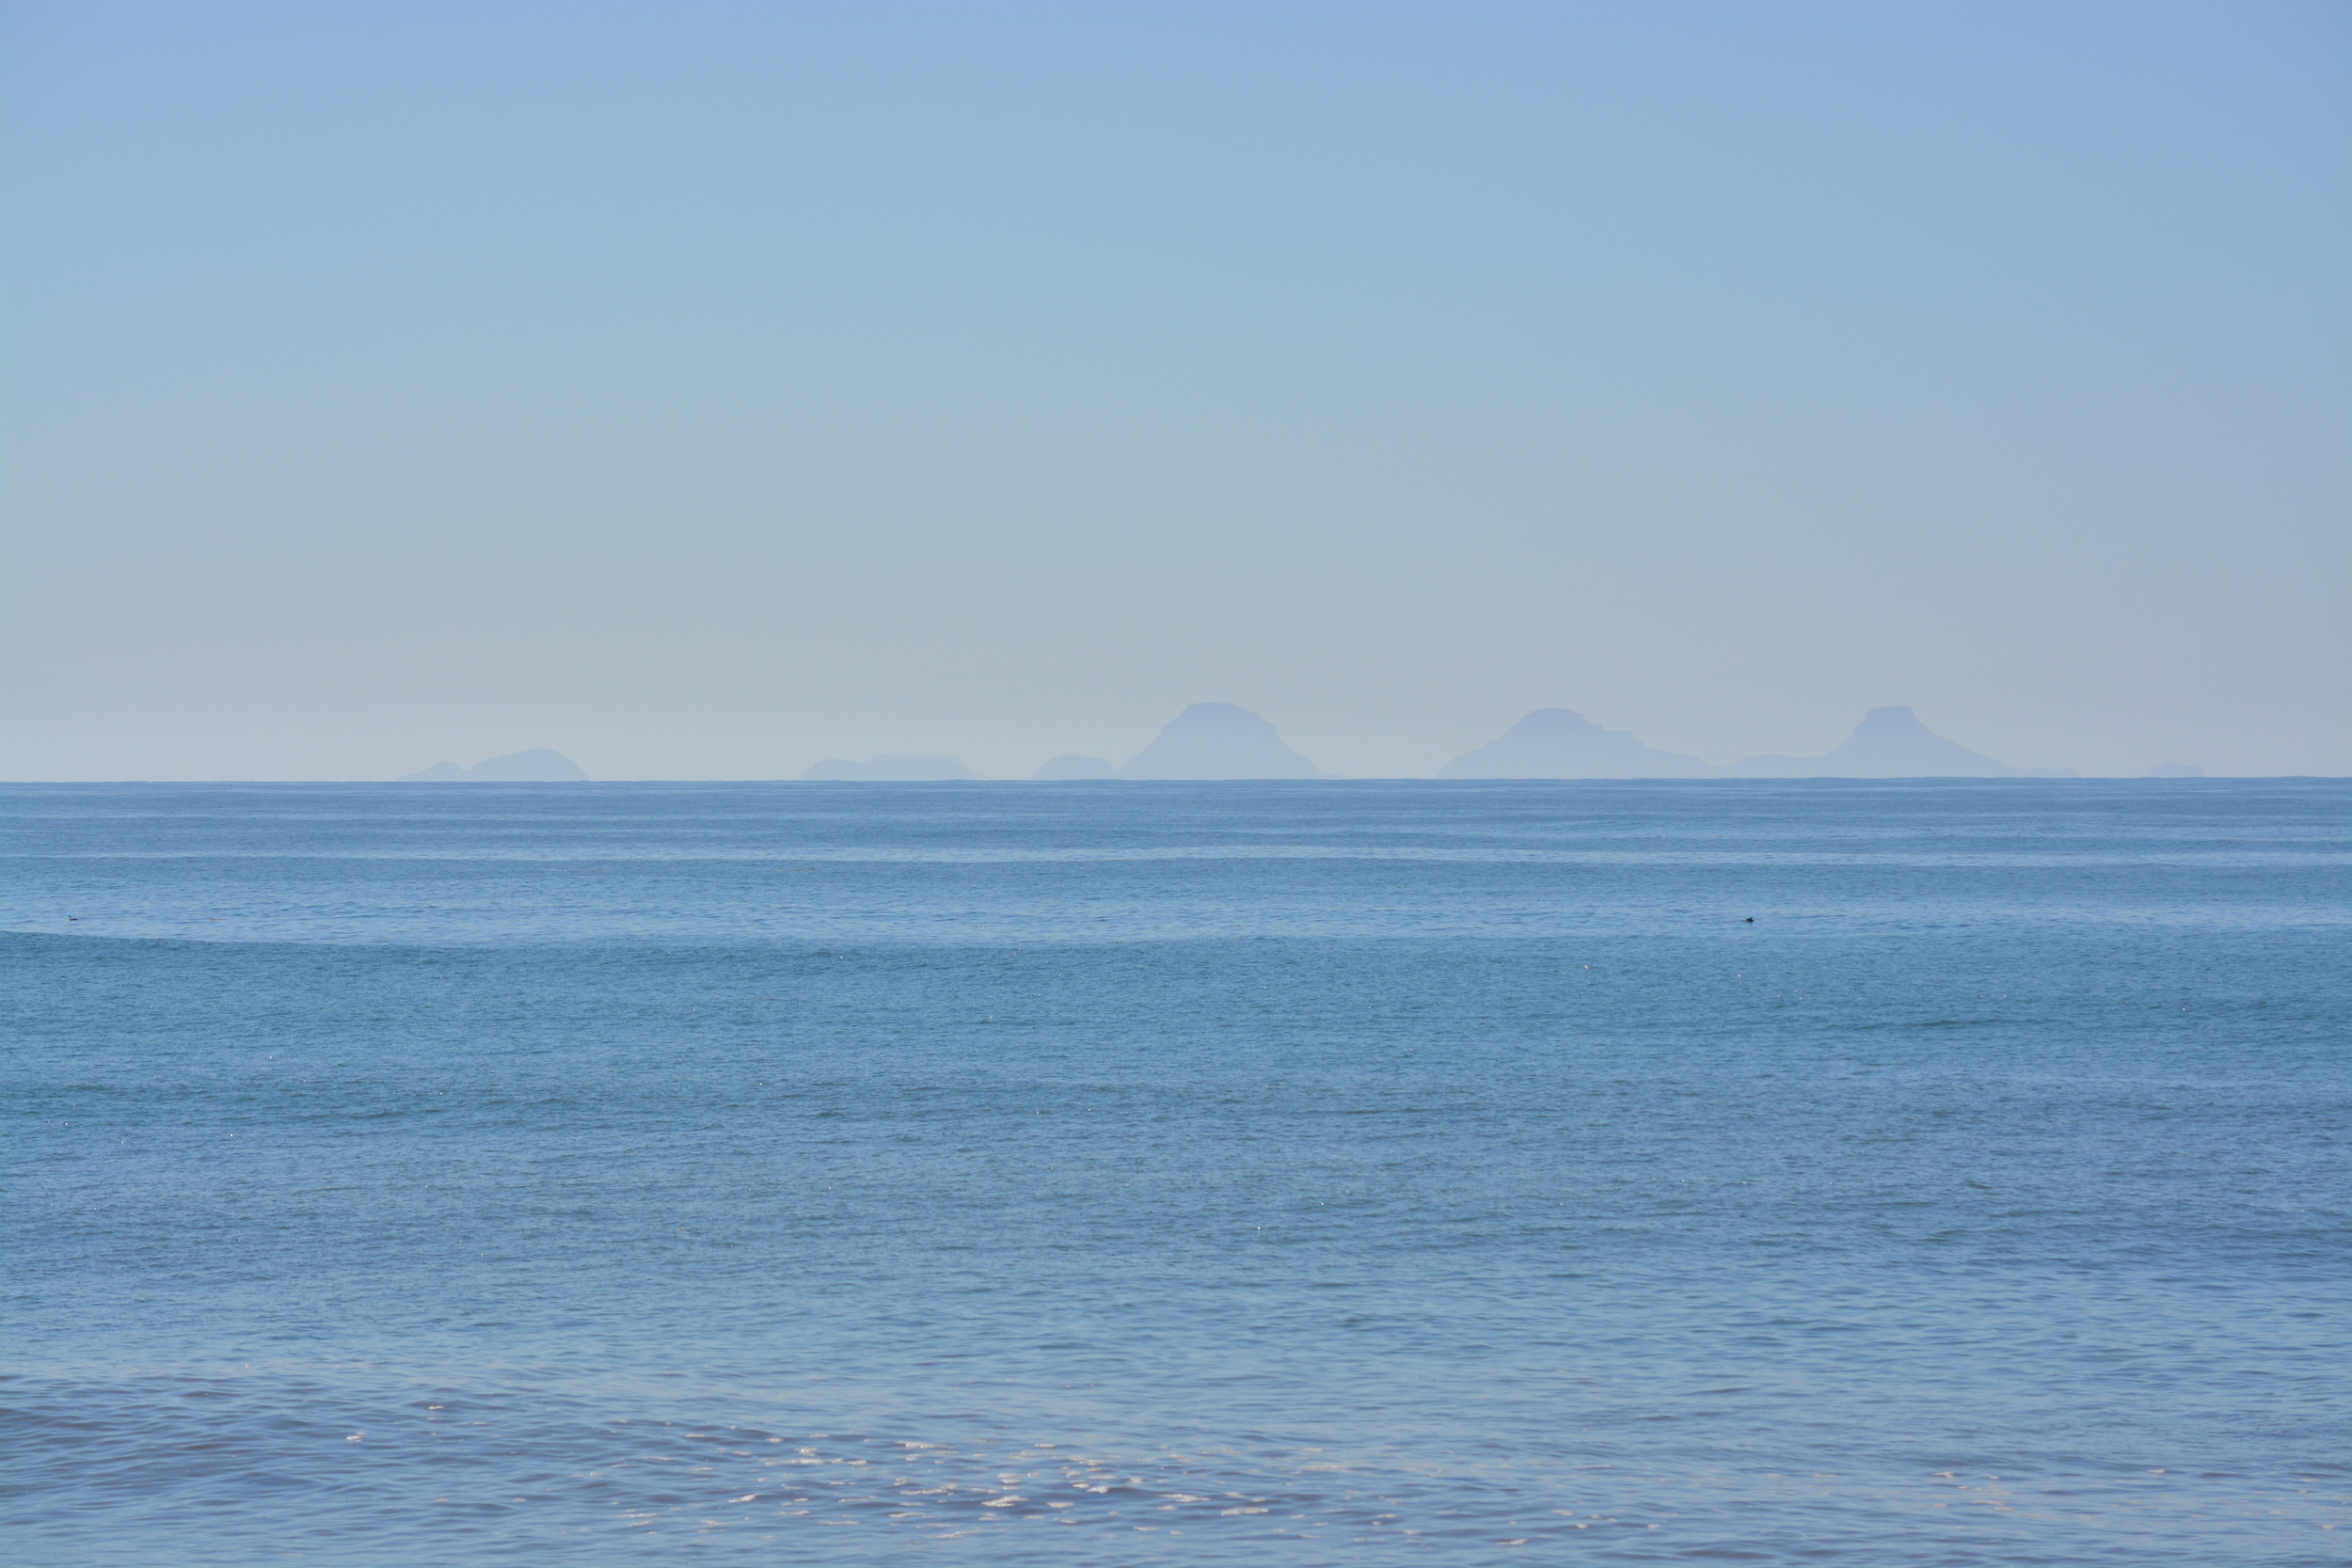 Baja California 10-5-13 Shipwrecks Surfing Adventure Ocean Experience Surf School San Diego (50).JPG